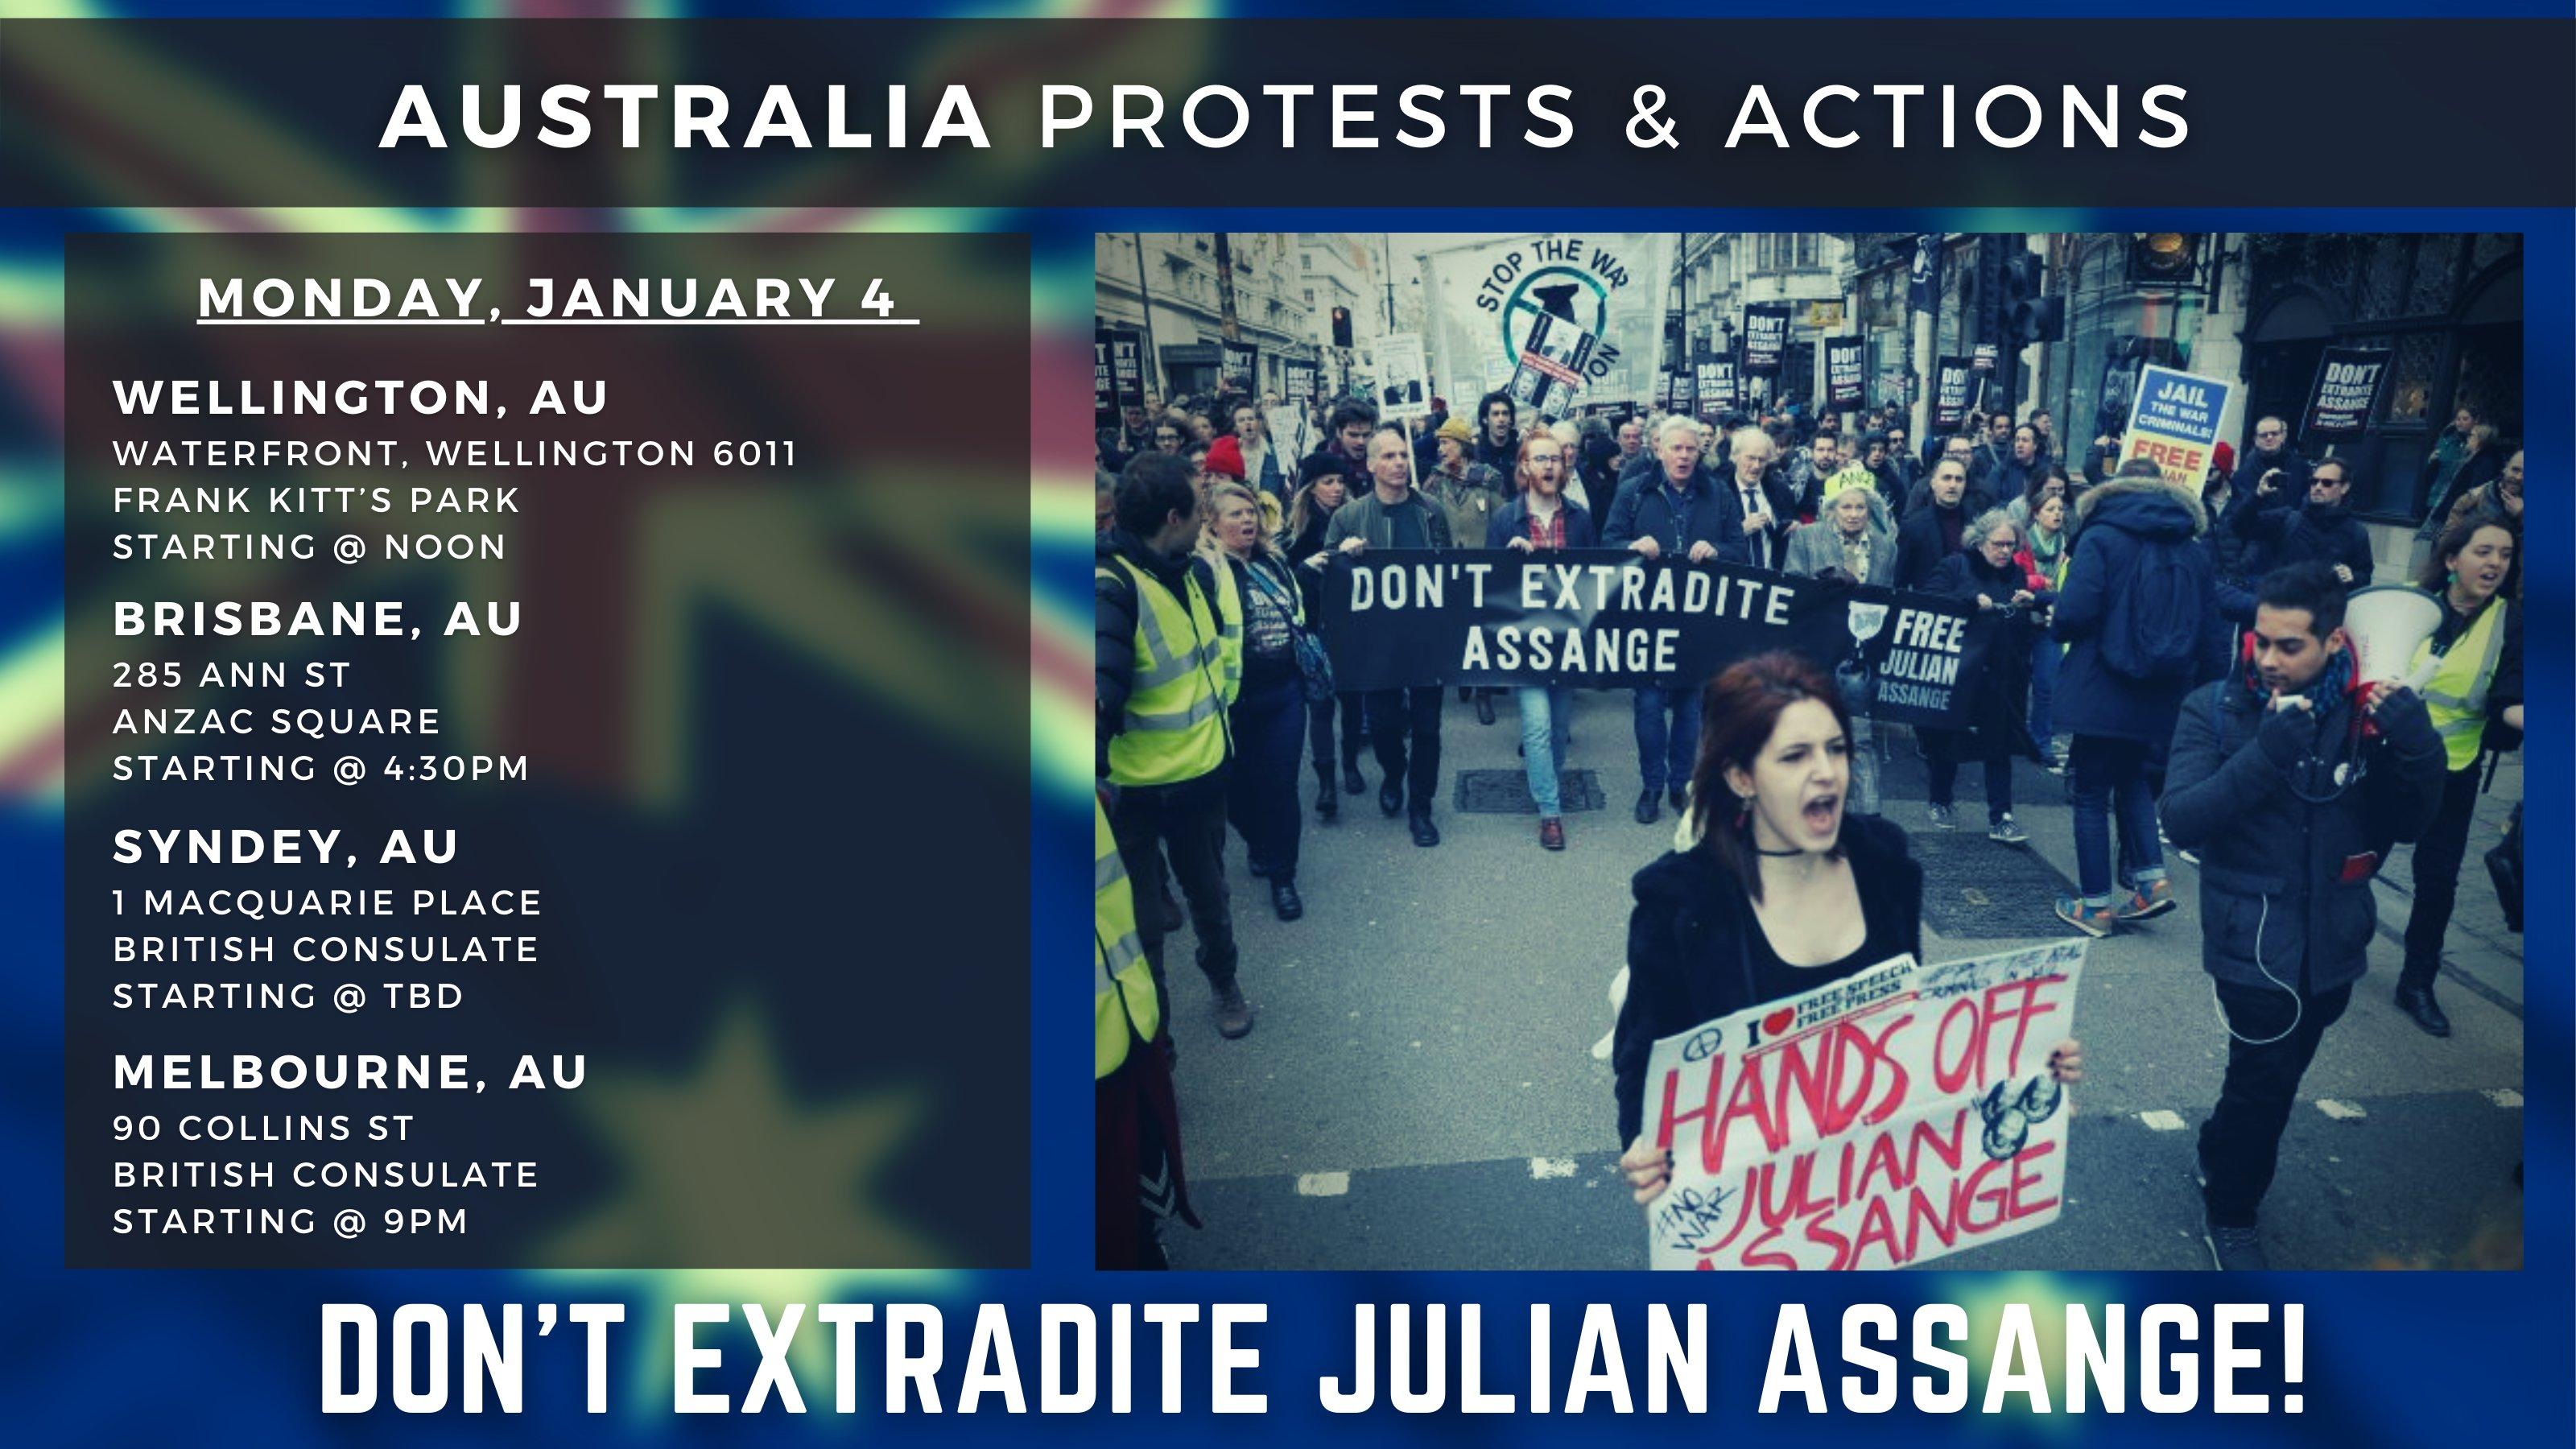 4jan21_oz_protests.jpeg